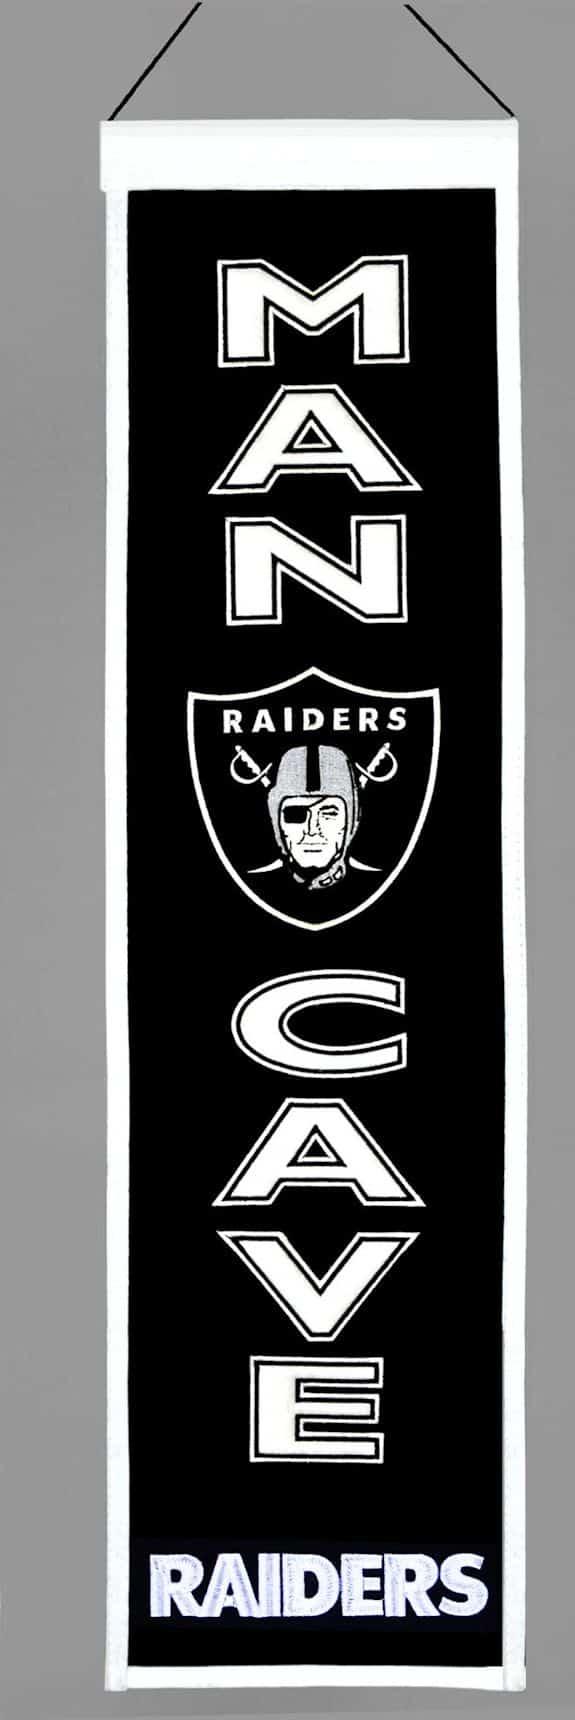 Man Cave Oakland : Oakland raiders wool man cave banner detroit game gear